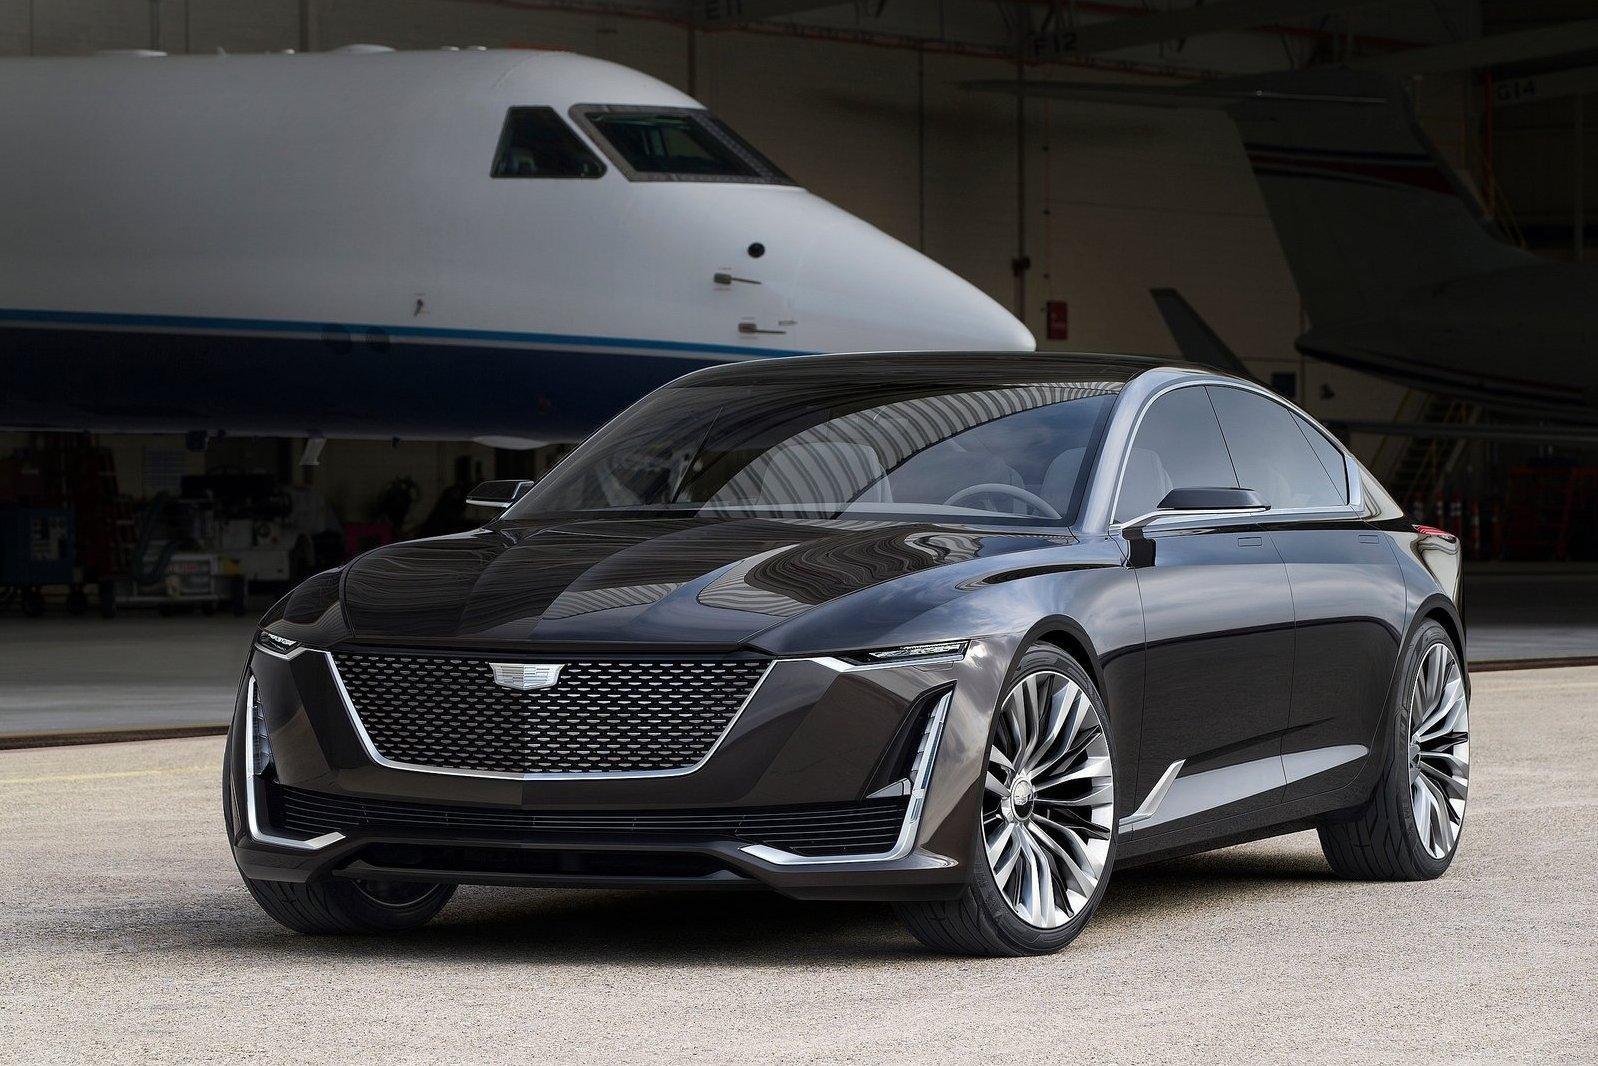 Cadillac похвалился прототипом будущего флагмана